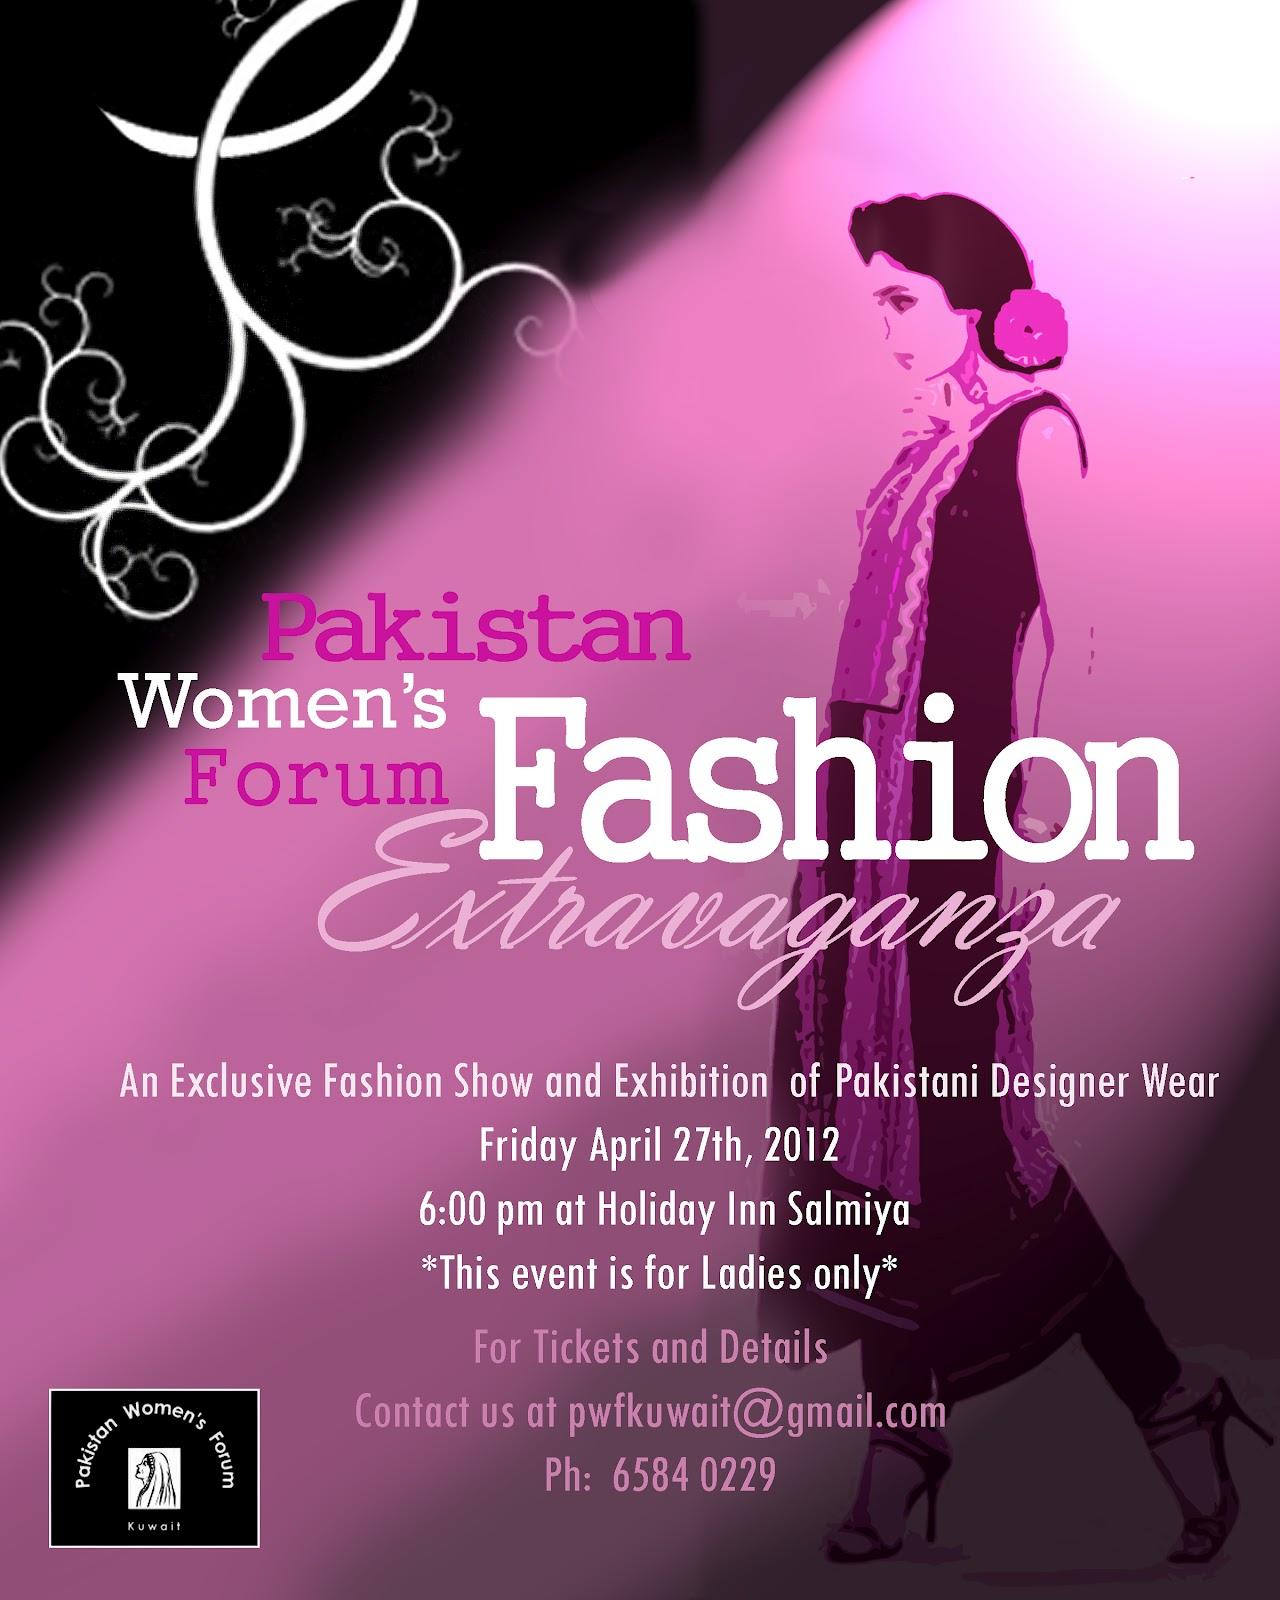 fashion show ticket template - pakistan fashion extravaganza glamorous fashion show